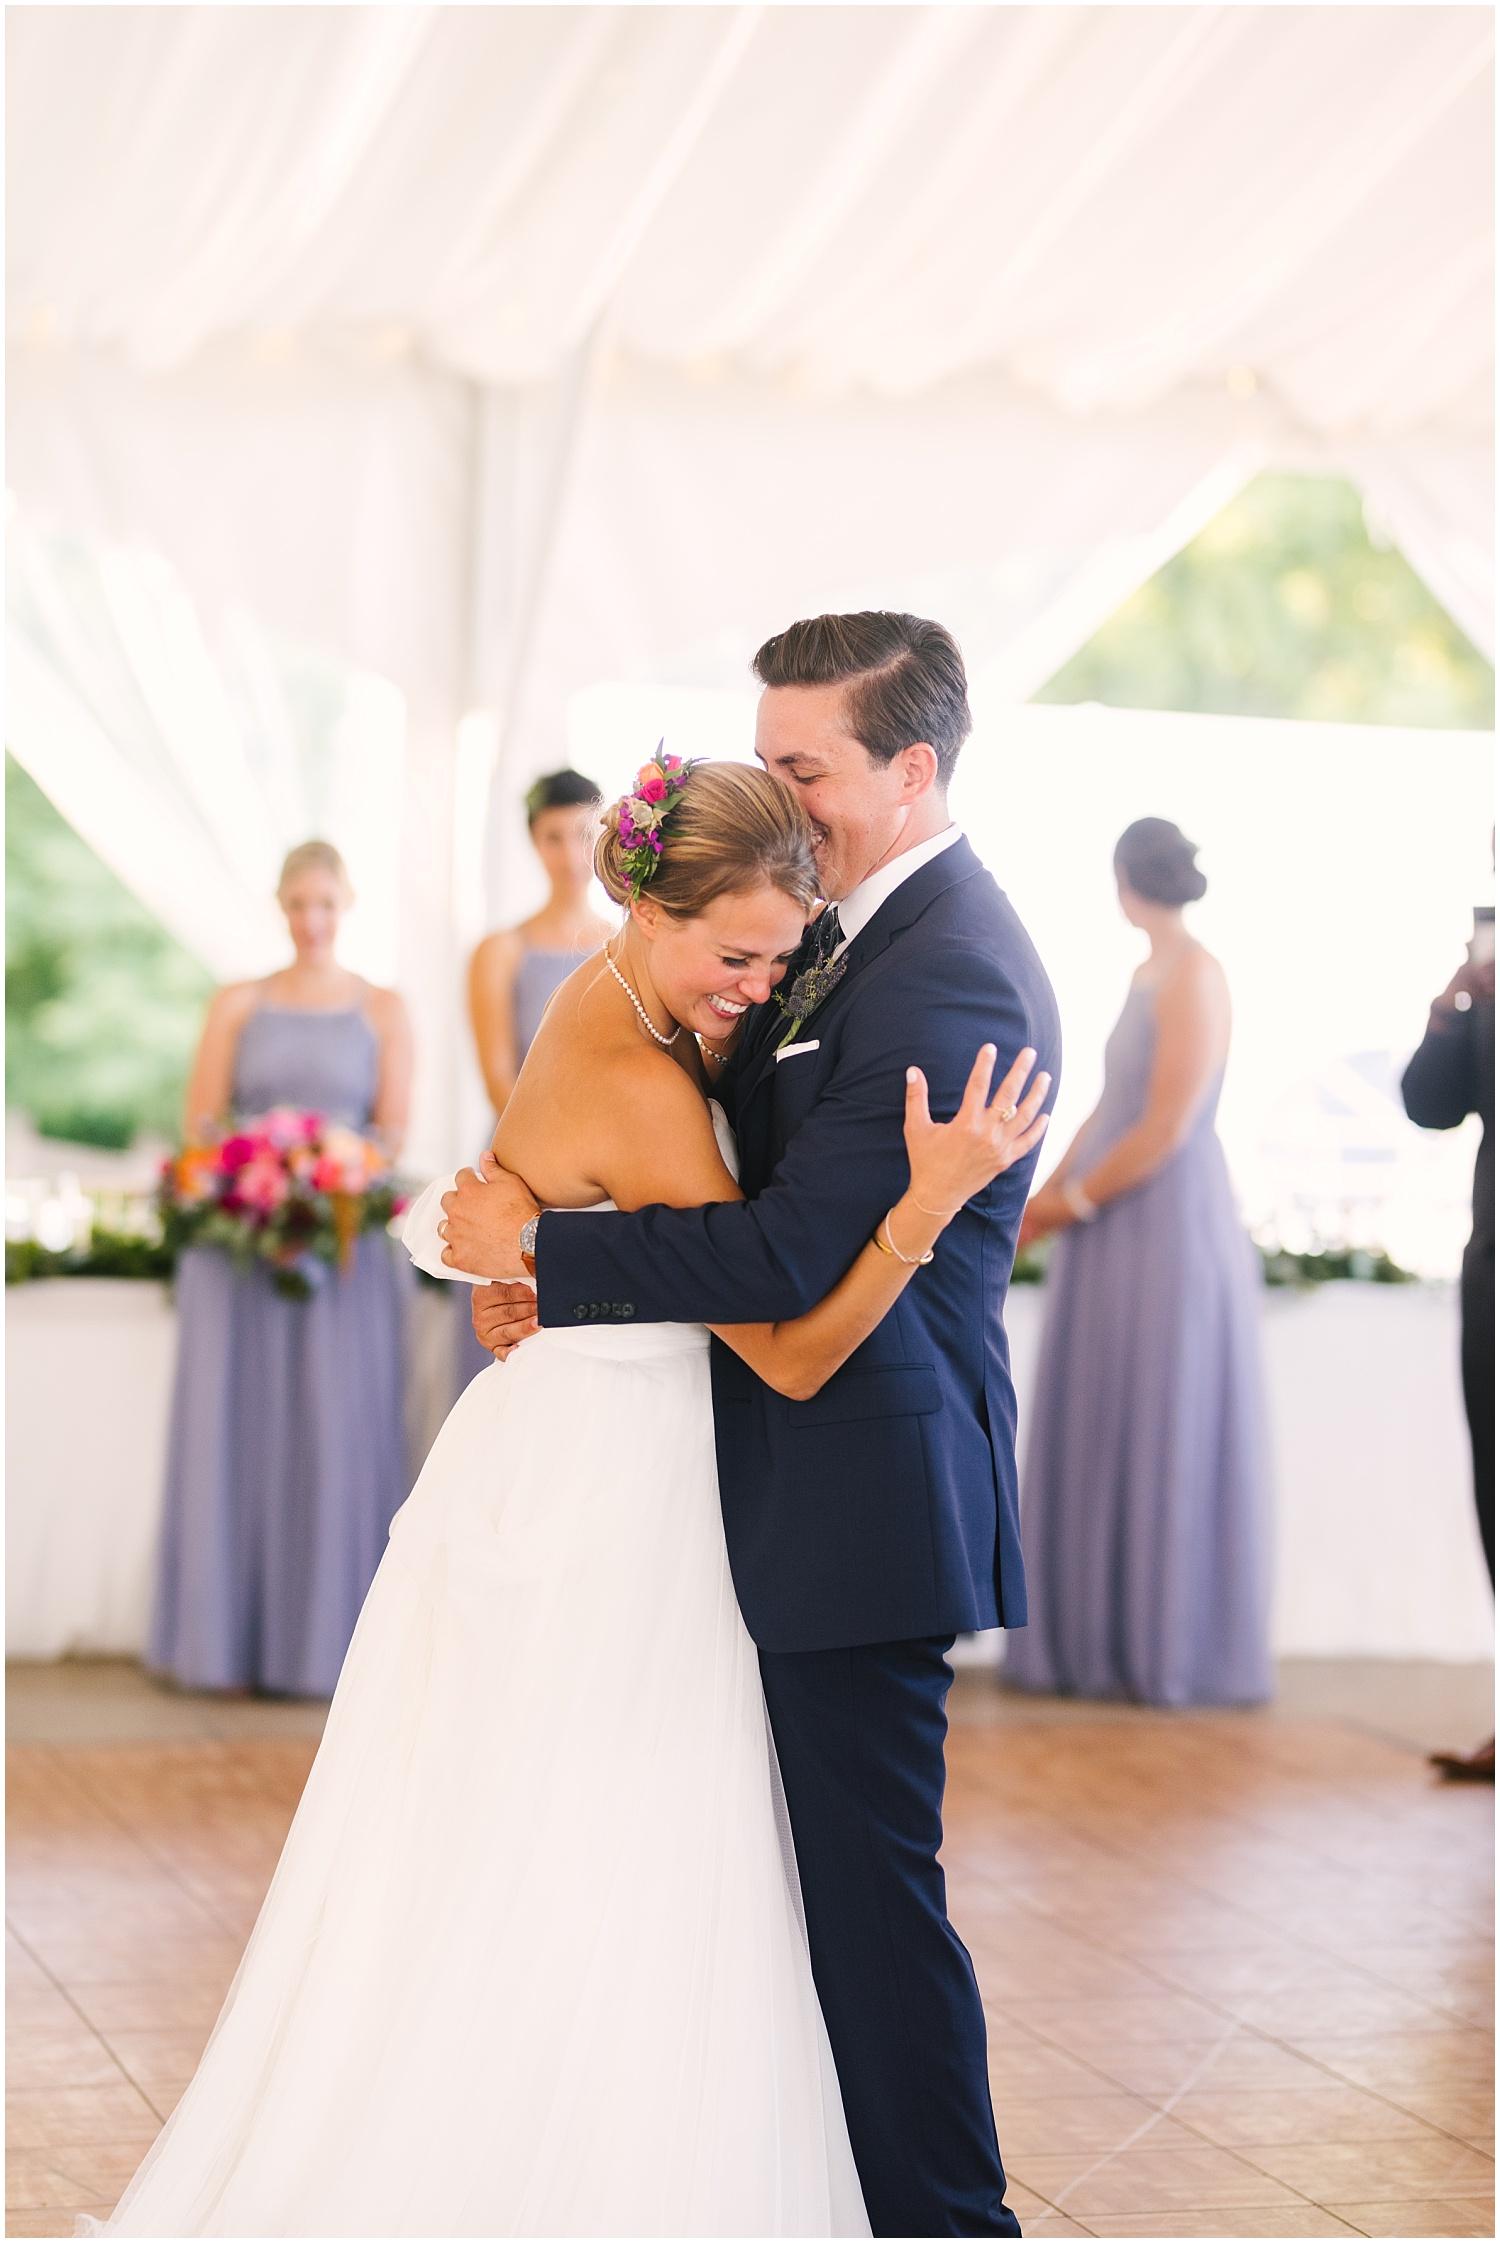 traditions+at+the+glen+wedding+binghamton+wedding (99).jpg